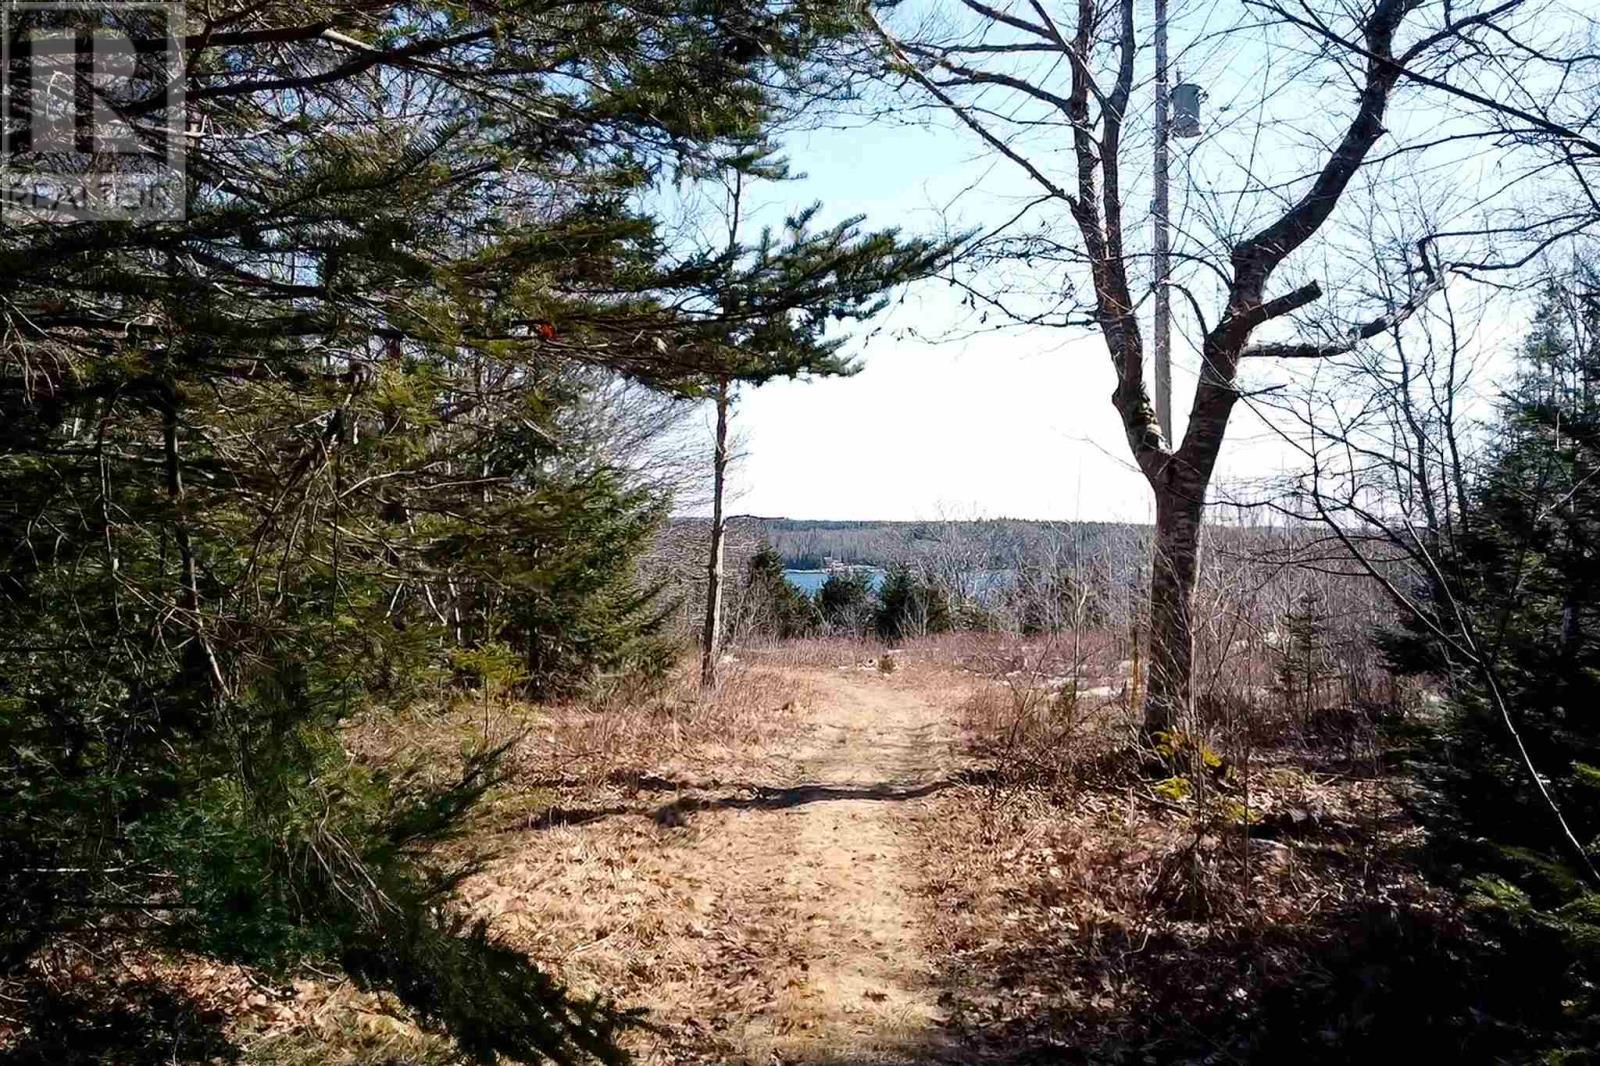 Lot B 293 Hillside Drive, Boutiliers Point, Nova Scotia  B3Z 1W9 - Photo 4 - 202106634